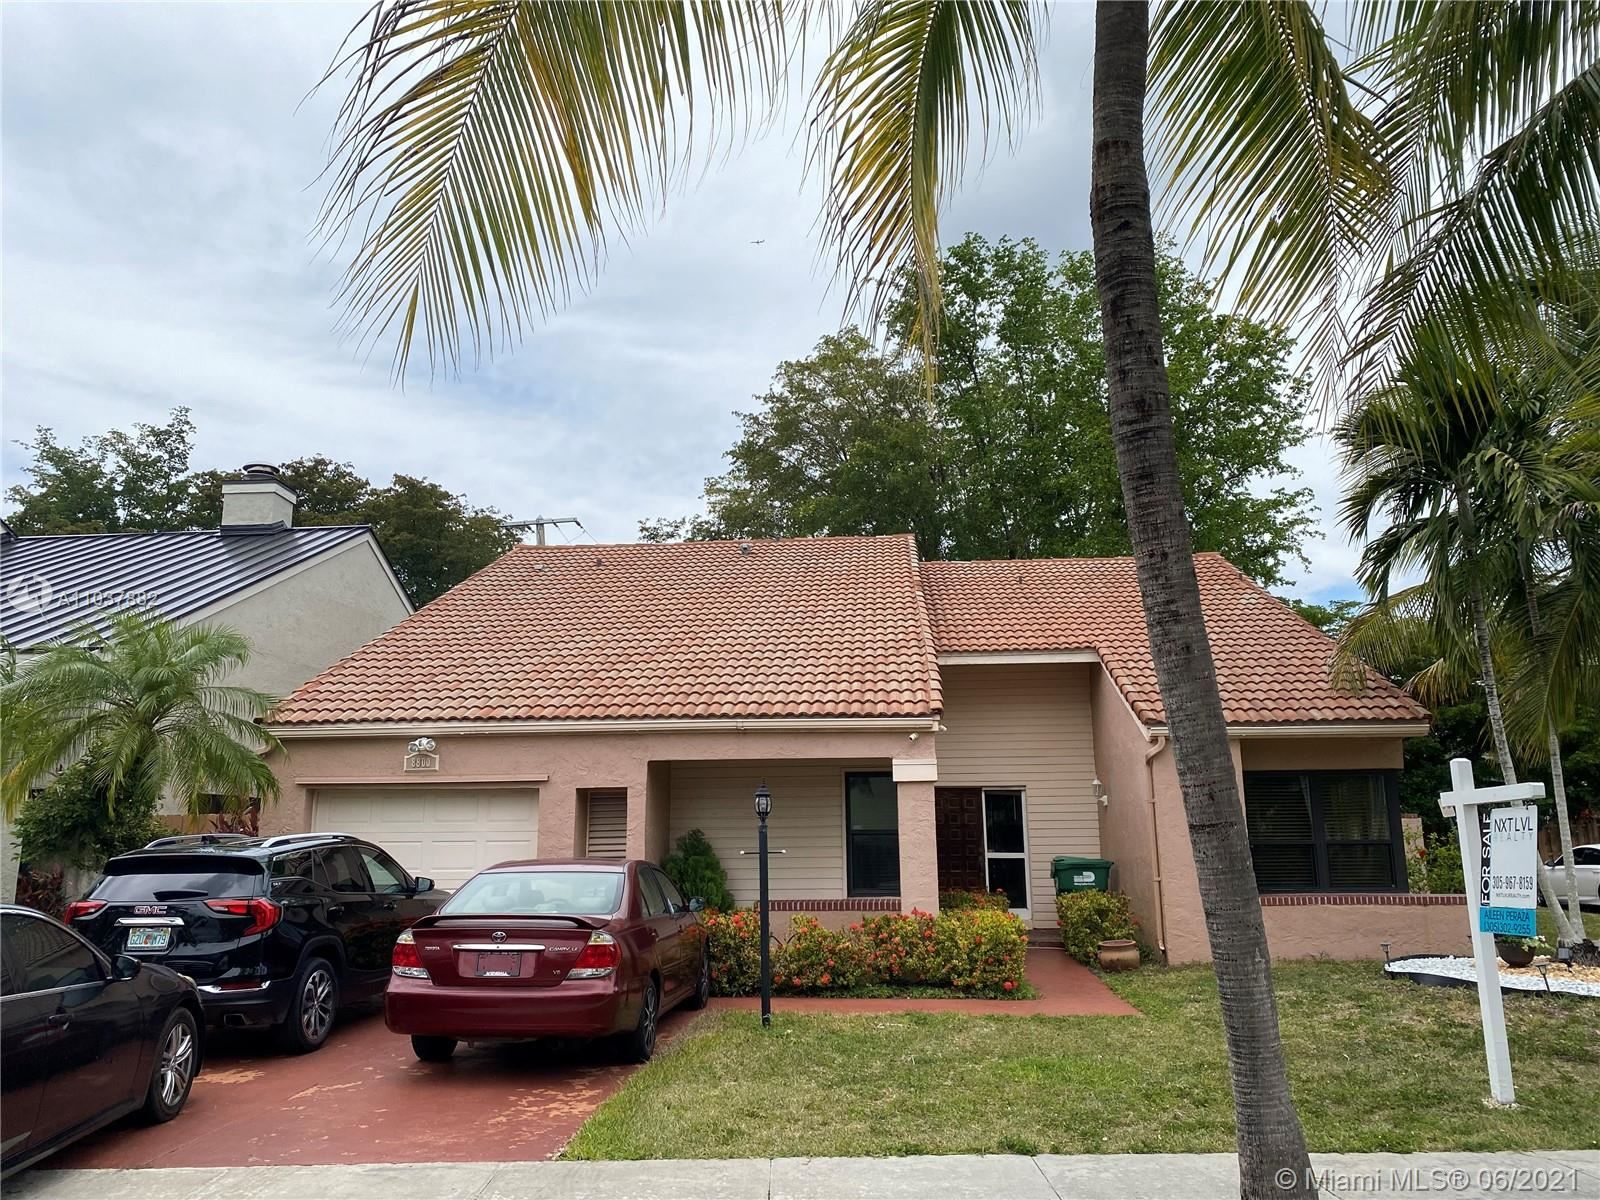 8800 SW 150th Place Cir, Miami, FL 33196 - #: A11037882